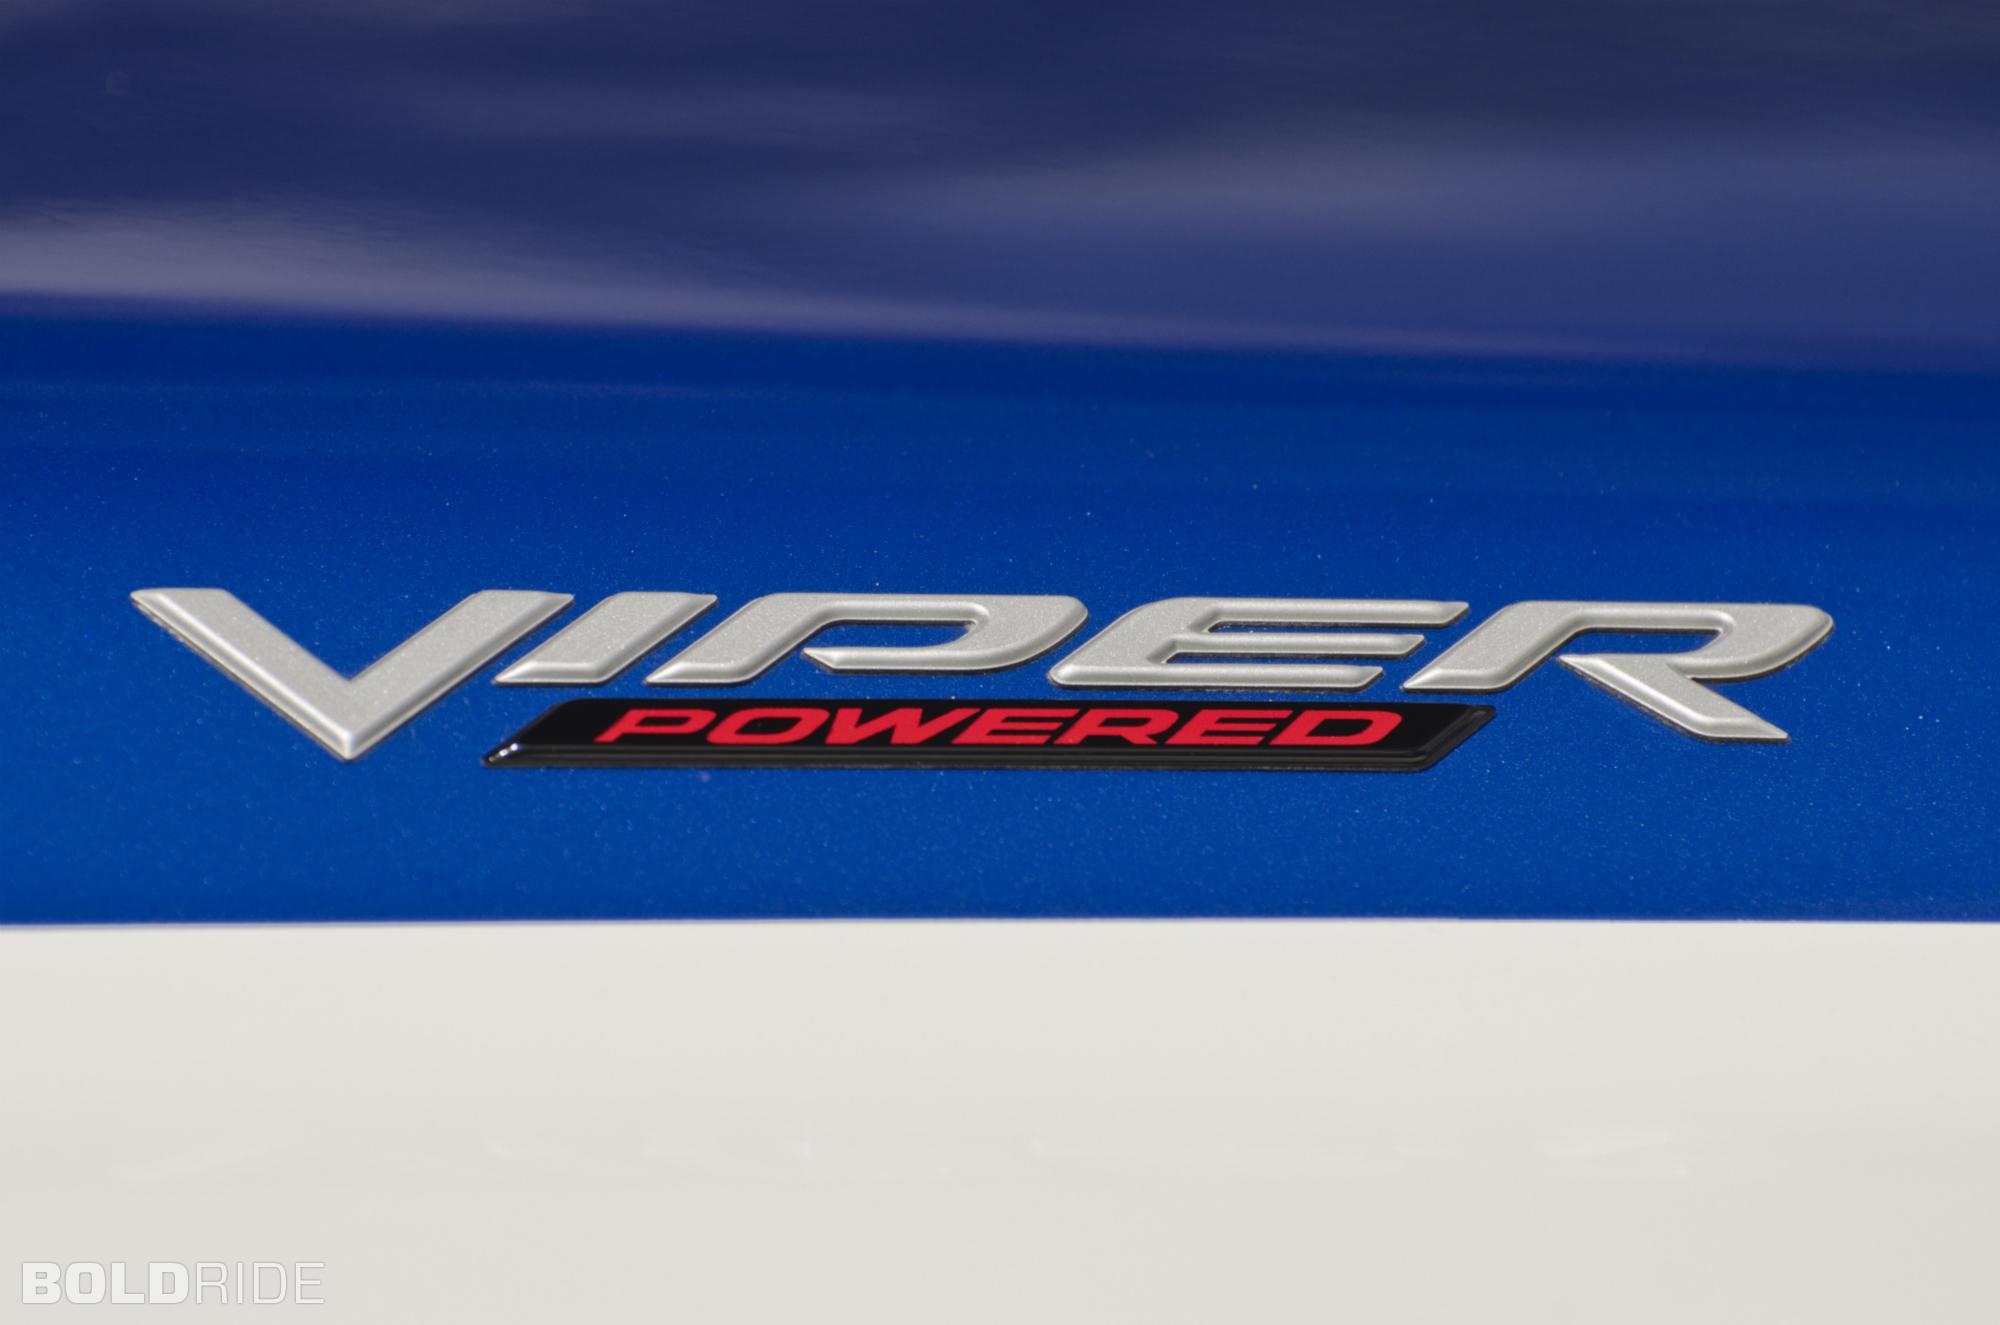 rods supertruck truck pickup engine engines logo wallpaper background 2000x1325